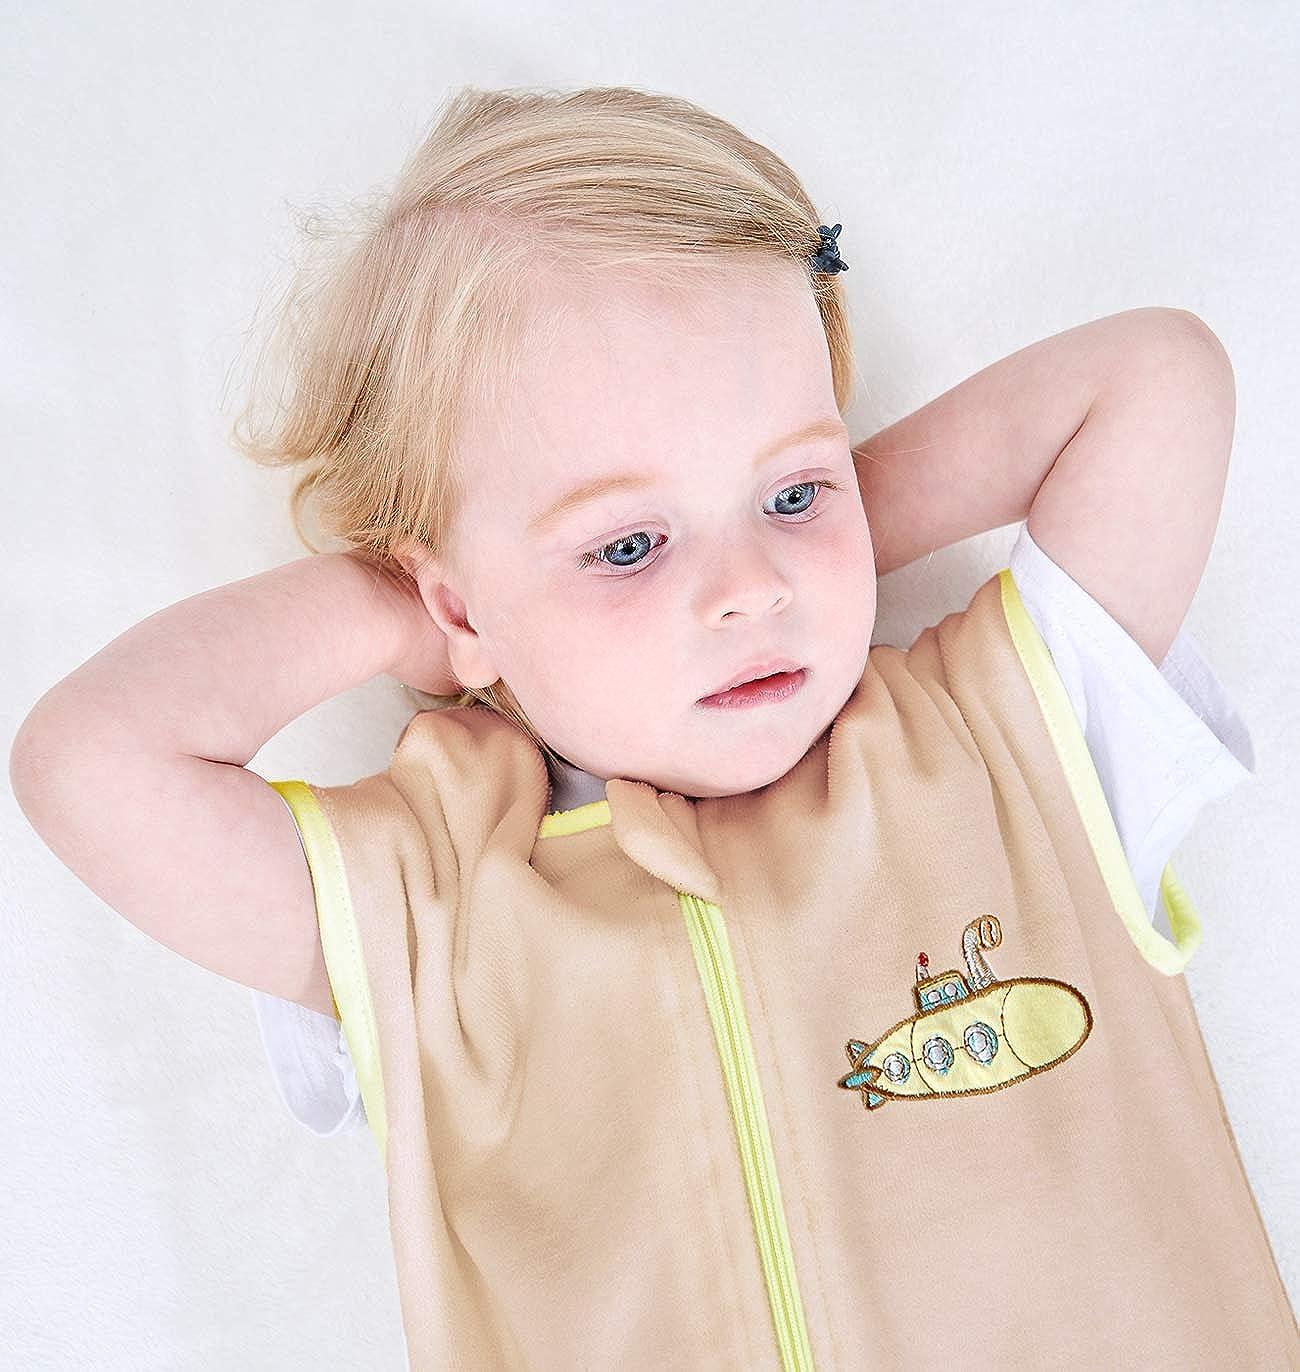 Sincere ililmmoe Baby Sleep Sack Spring Autumn Warm Infant Walking Sleeping Bag with Legs Wearable Blankets Pajamas 6months-4Years